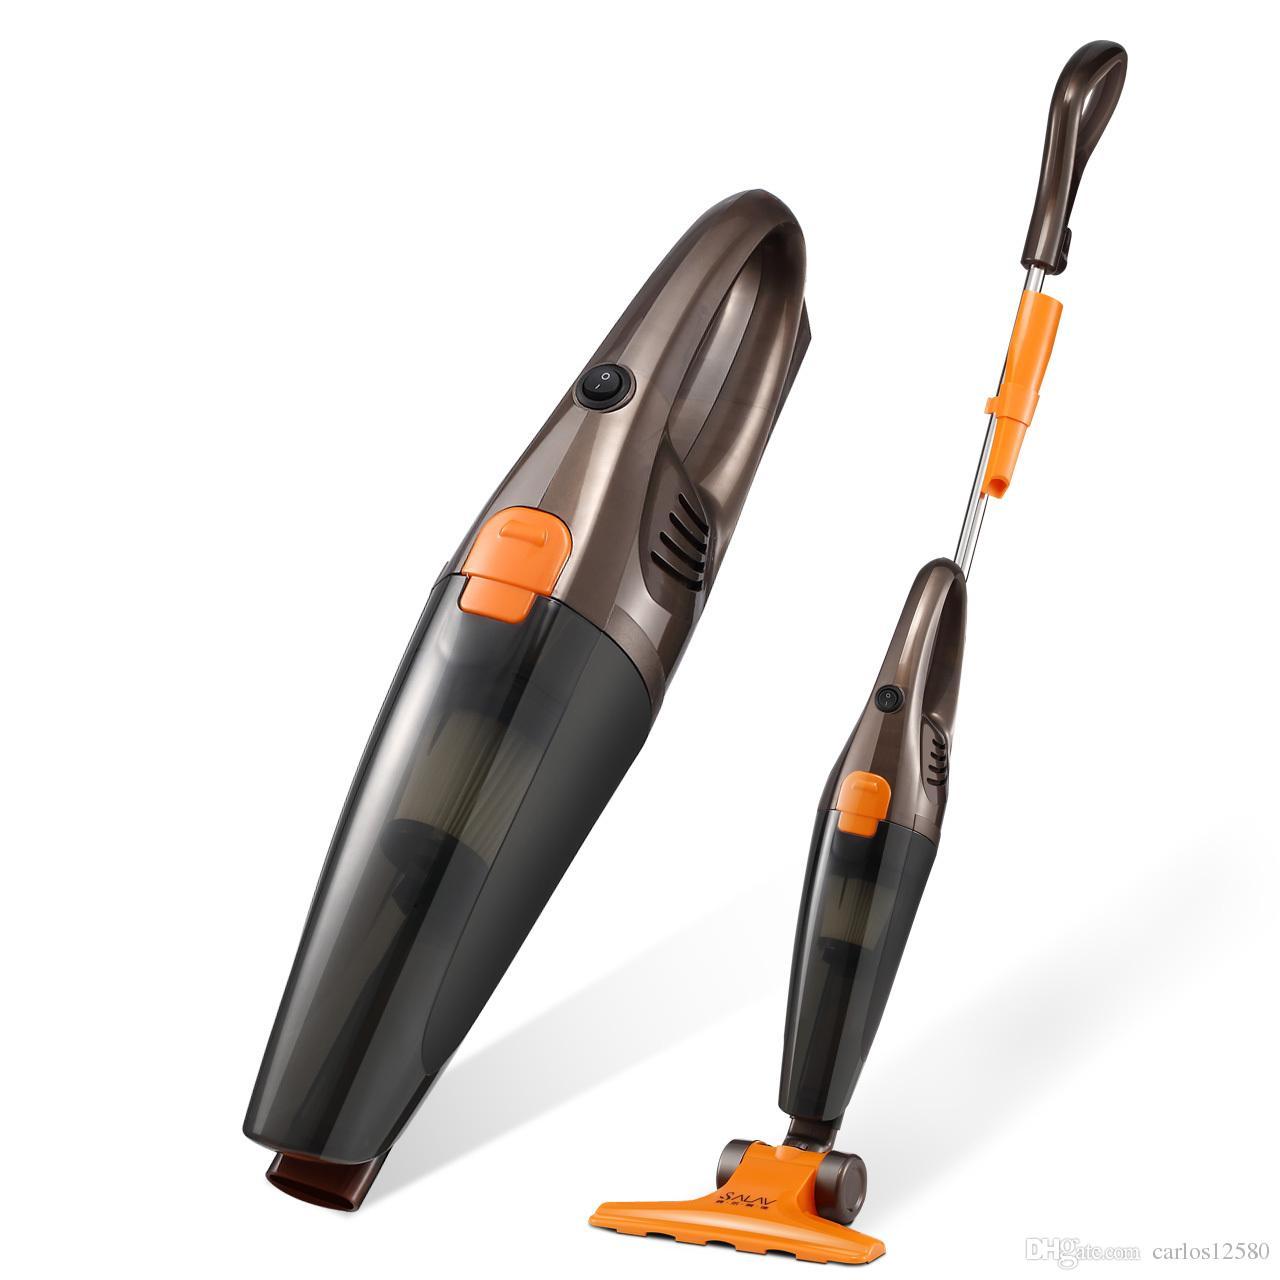 Quiet Vacuum Cleaner 2017 brad, bell vc8401 vacuum cleaner for household mite